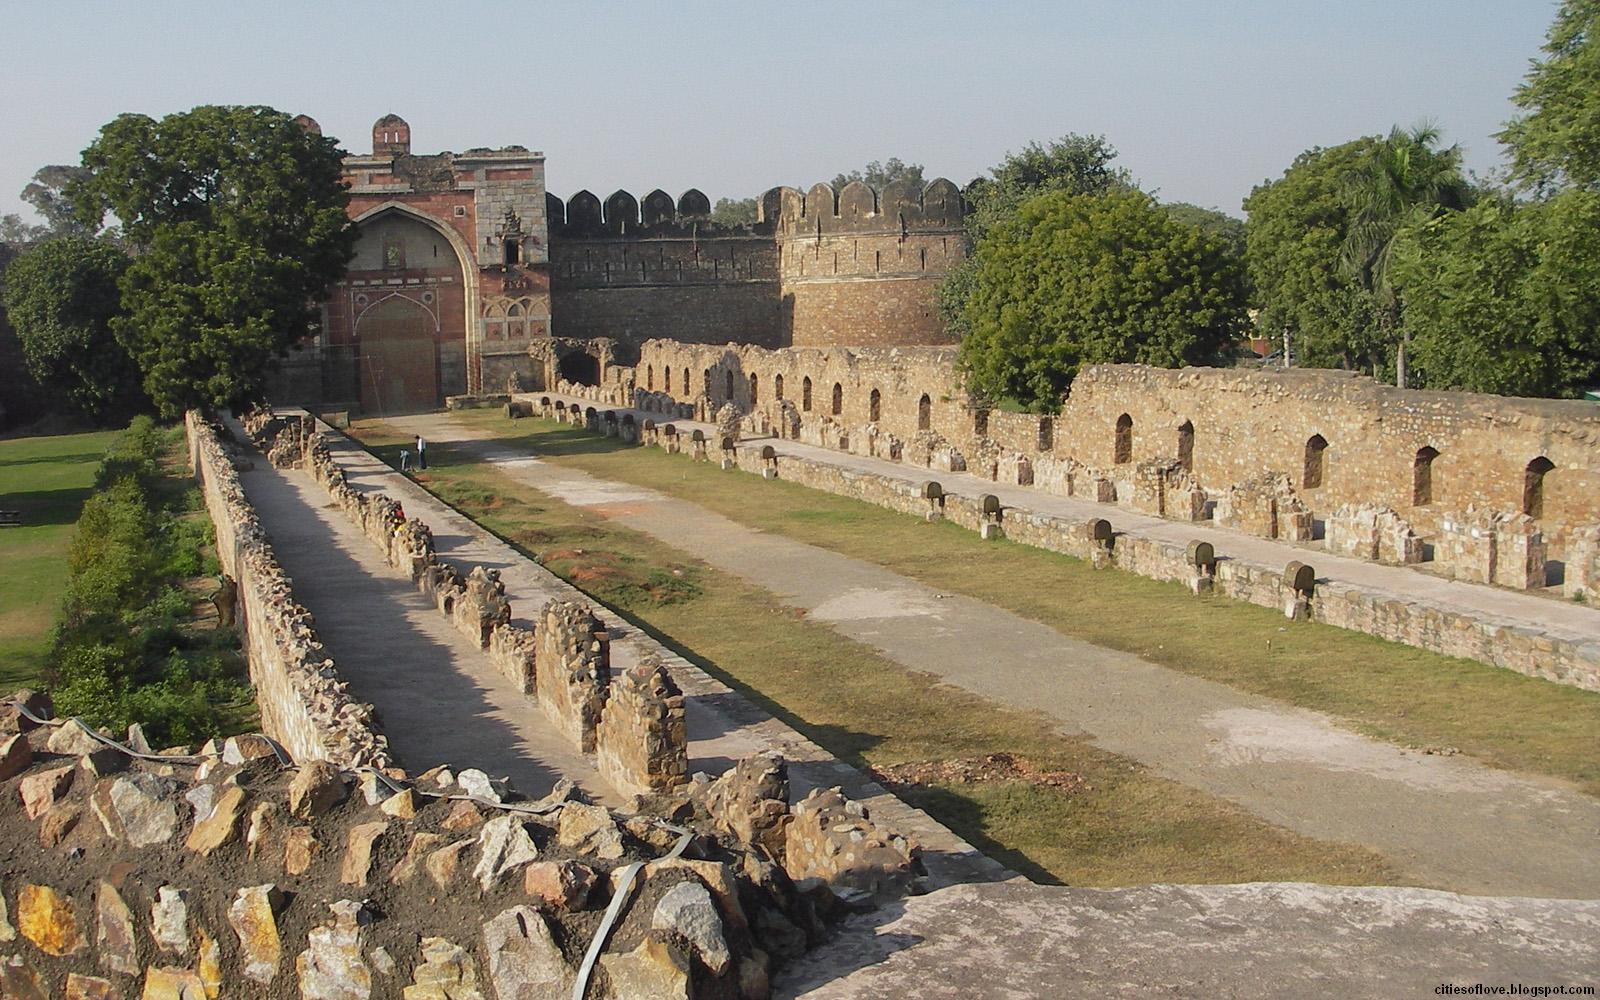 http://2.bp.blogspot.com/-okIHYzJ3OtI/UPKbNqFIujI/AAAAAAAAAP0/N46bCQ40RuA/s1600/New_Delhi_Historical_Ruins_Beautiful_Indian_City_India_Hd_Desktop_Wallpaper_citiesoflove.blogspot.com.jpg